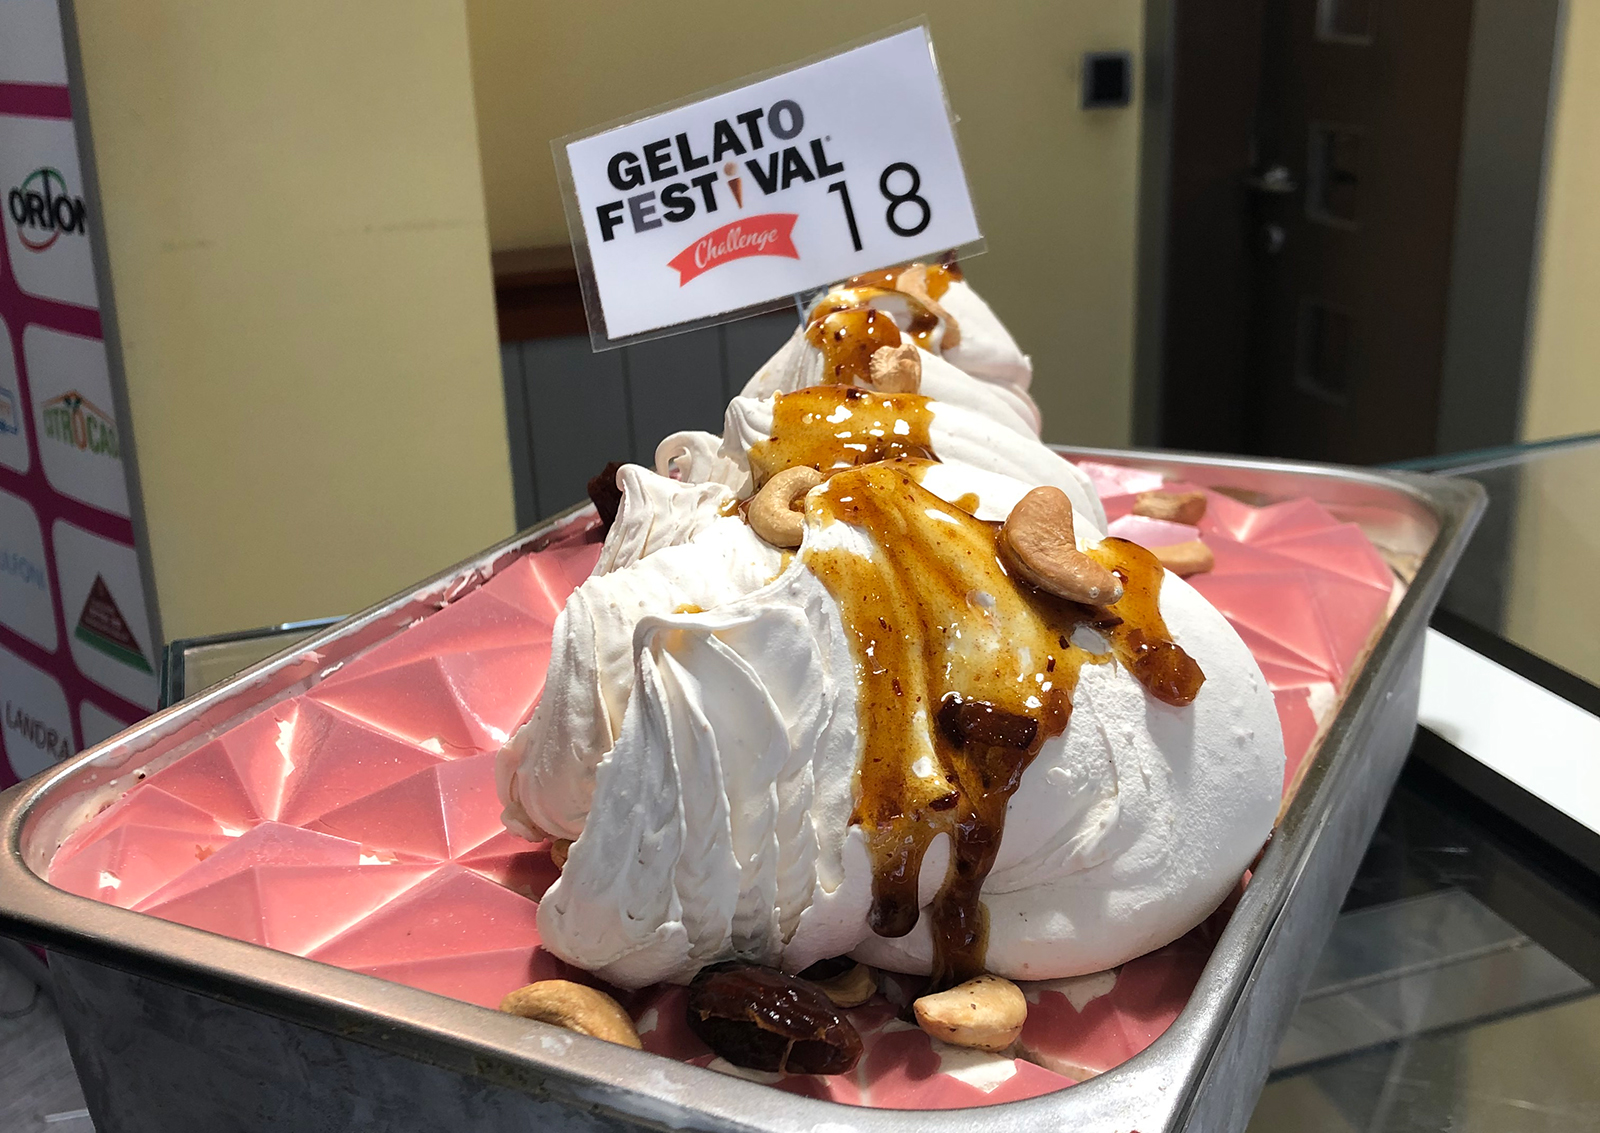 gelato-festival-palfi-attila-heviz-rozsakert-etterem-fagyizo-csodalatosbalaton4_1.jpg